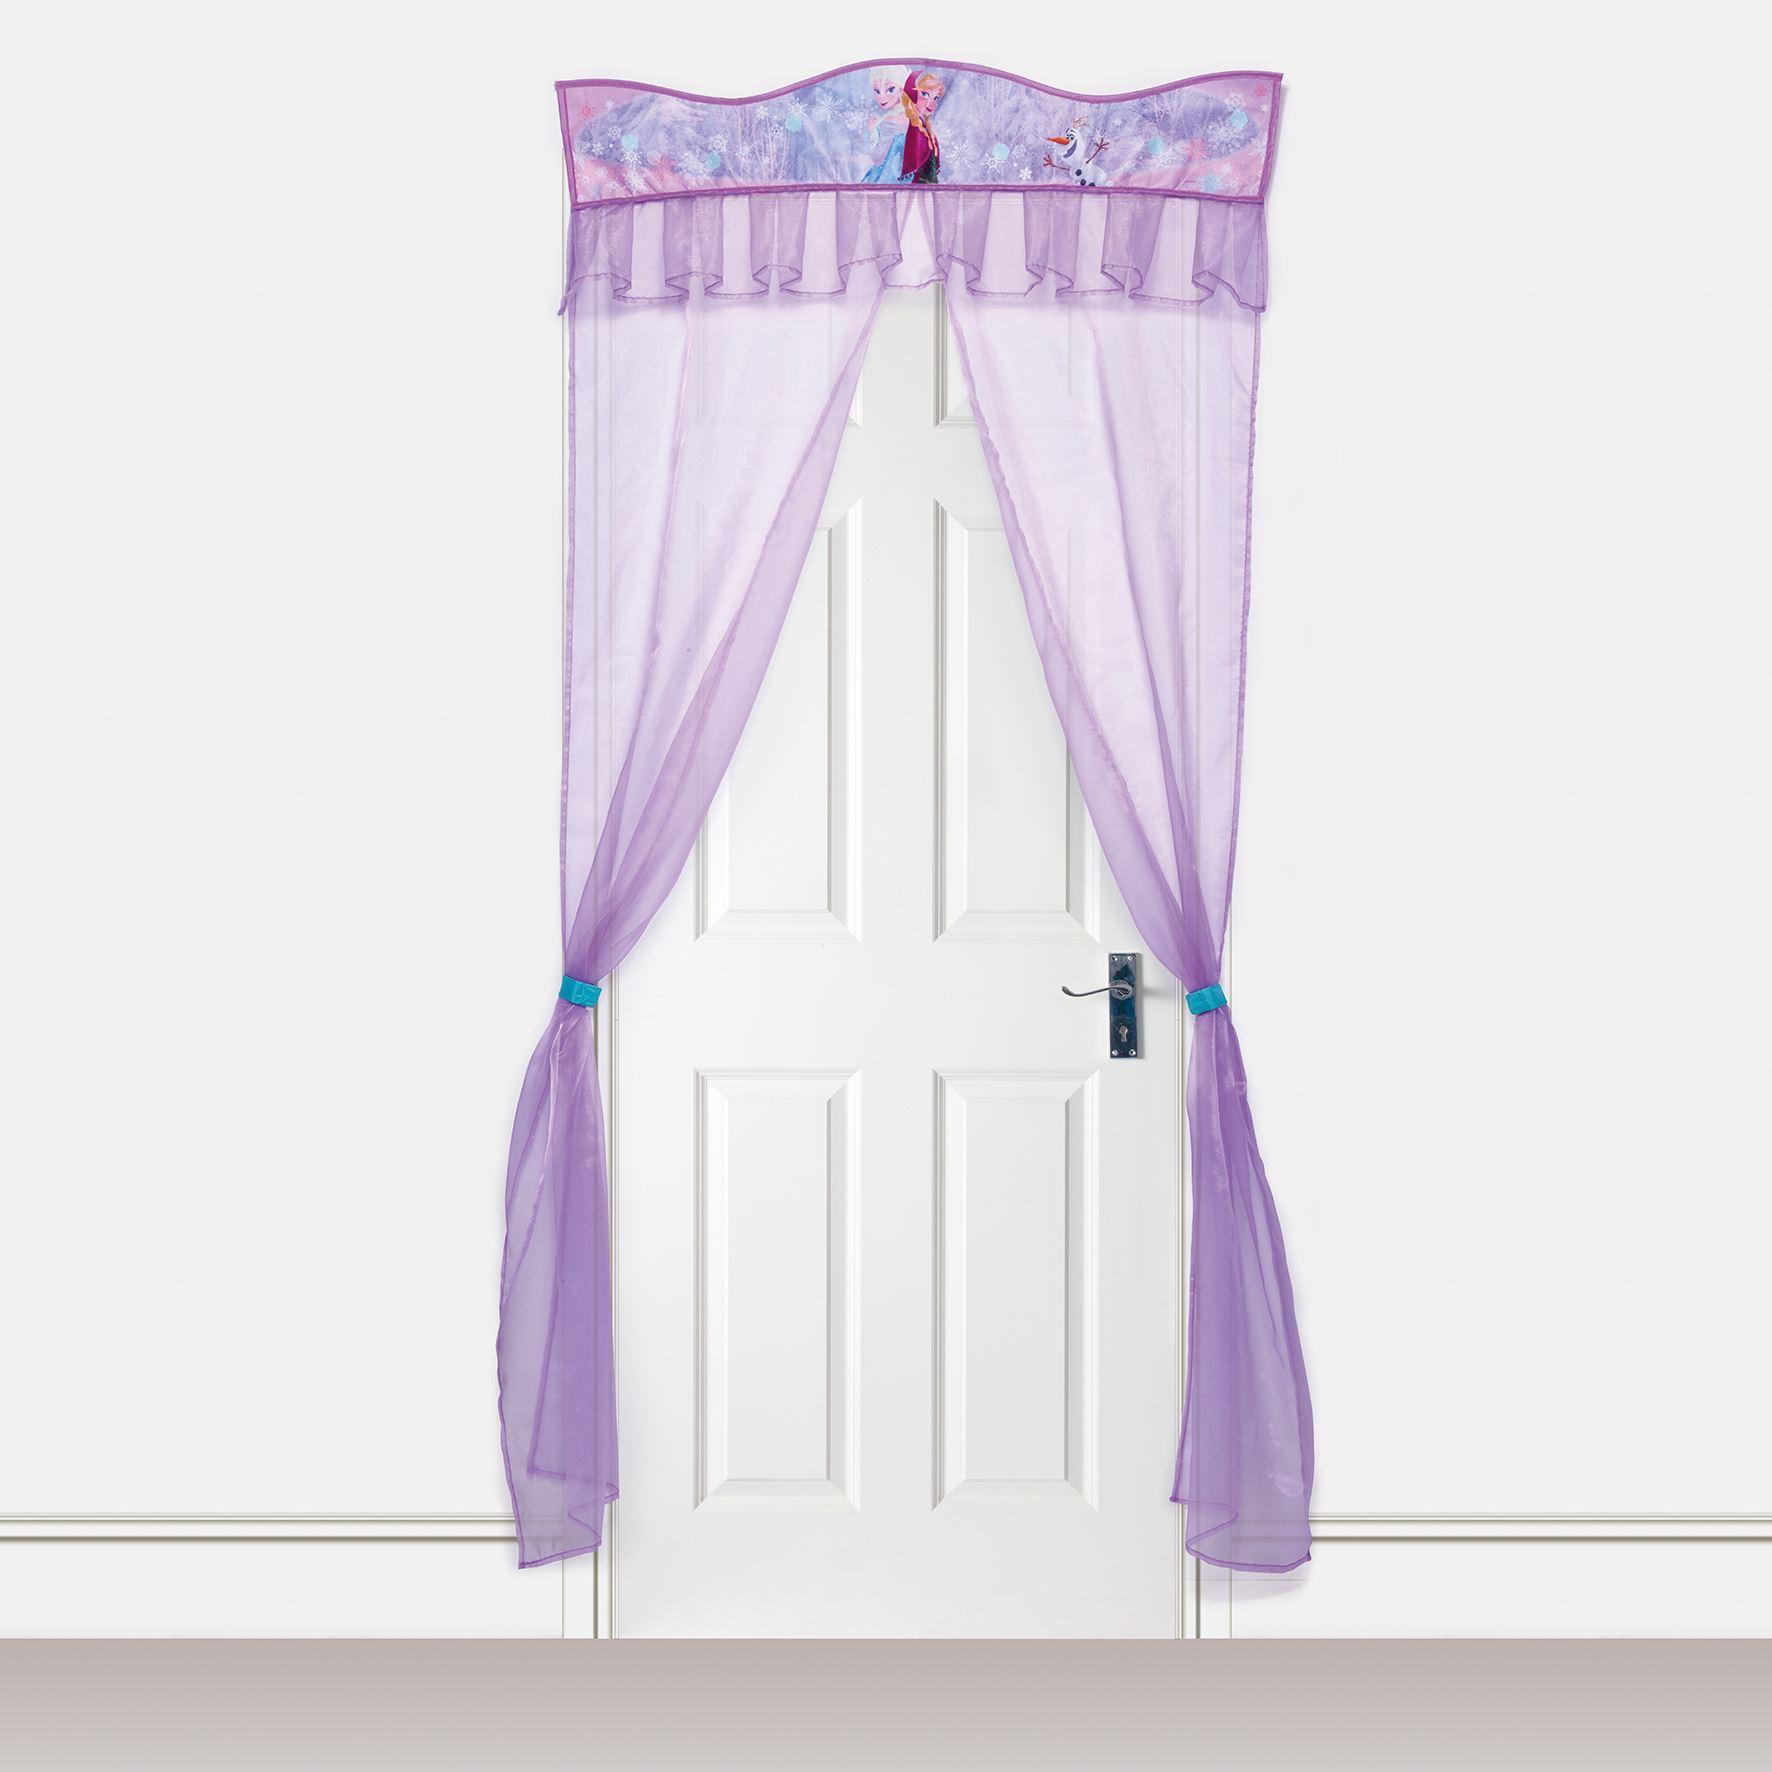 About disney frozen door decor curtain new official bedroom princess